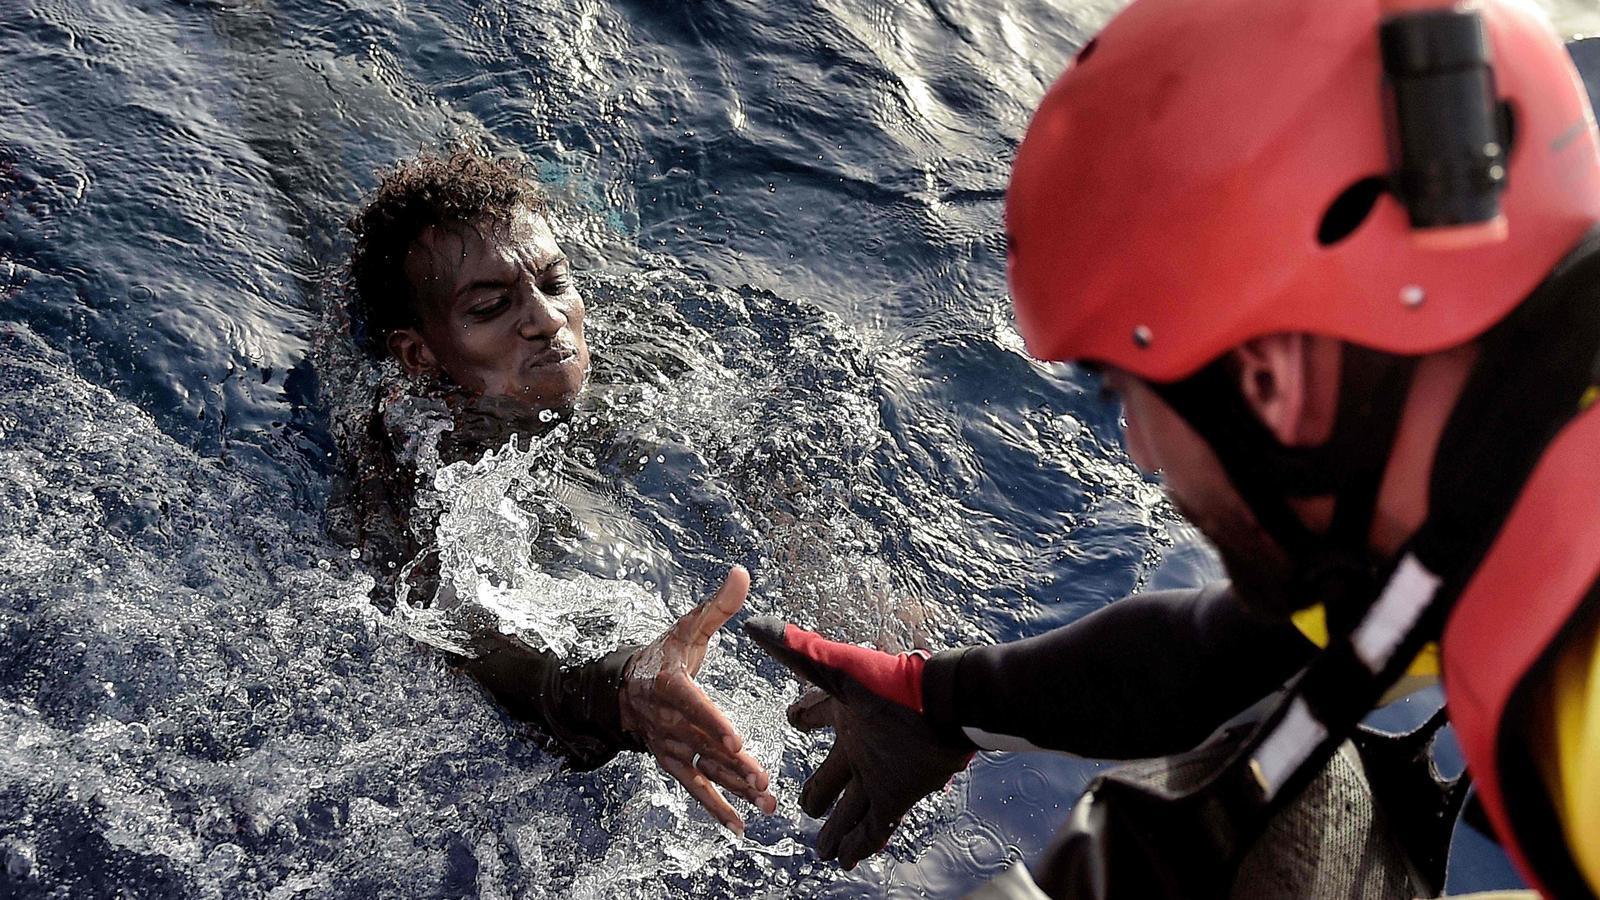 REFUGIADOS-UE II - Página 2 ONG-Proactiva-Open-Arms-mediterrani_1708639223_36103236_540x306